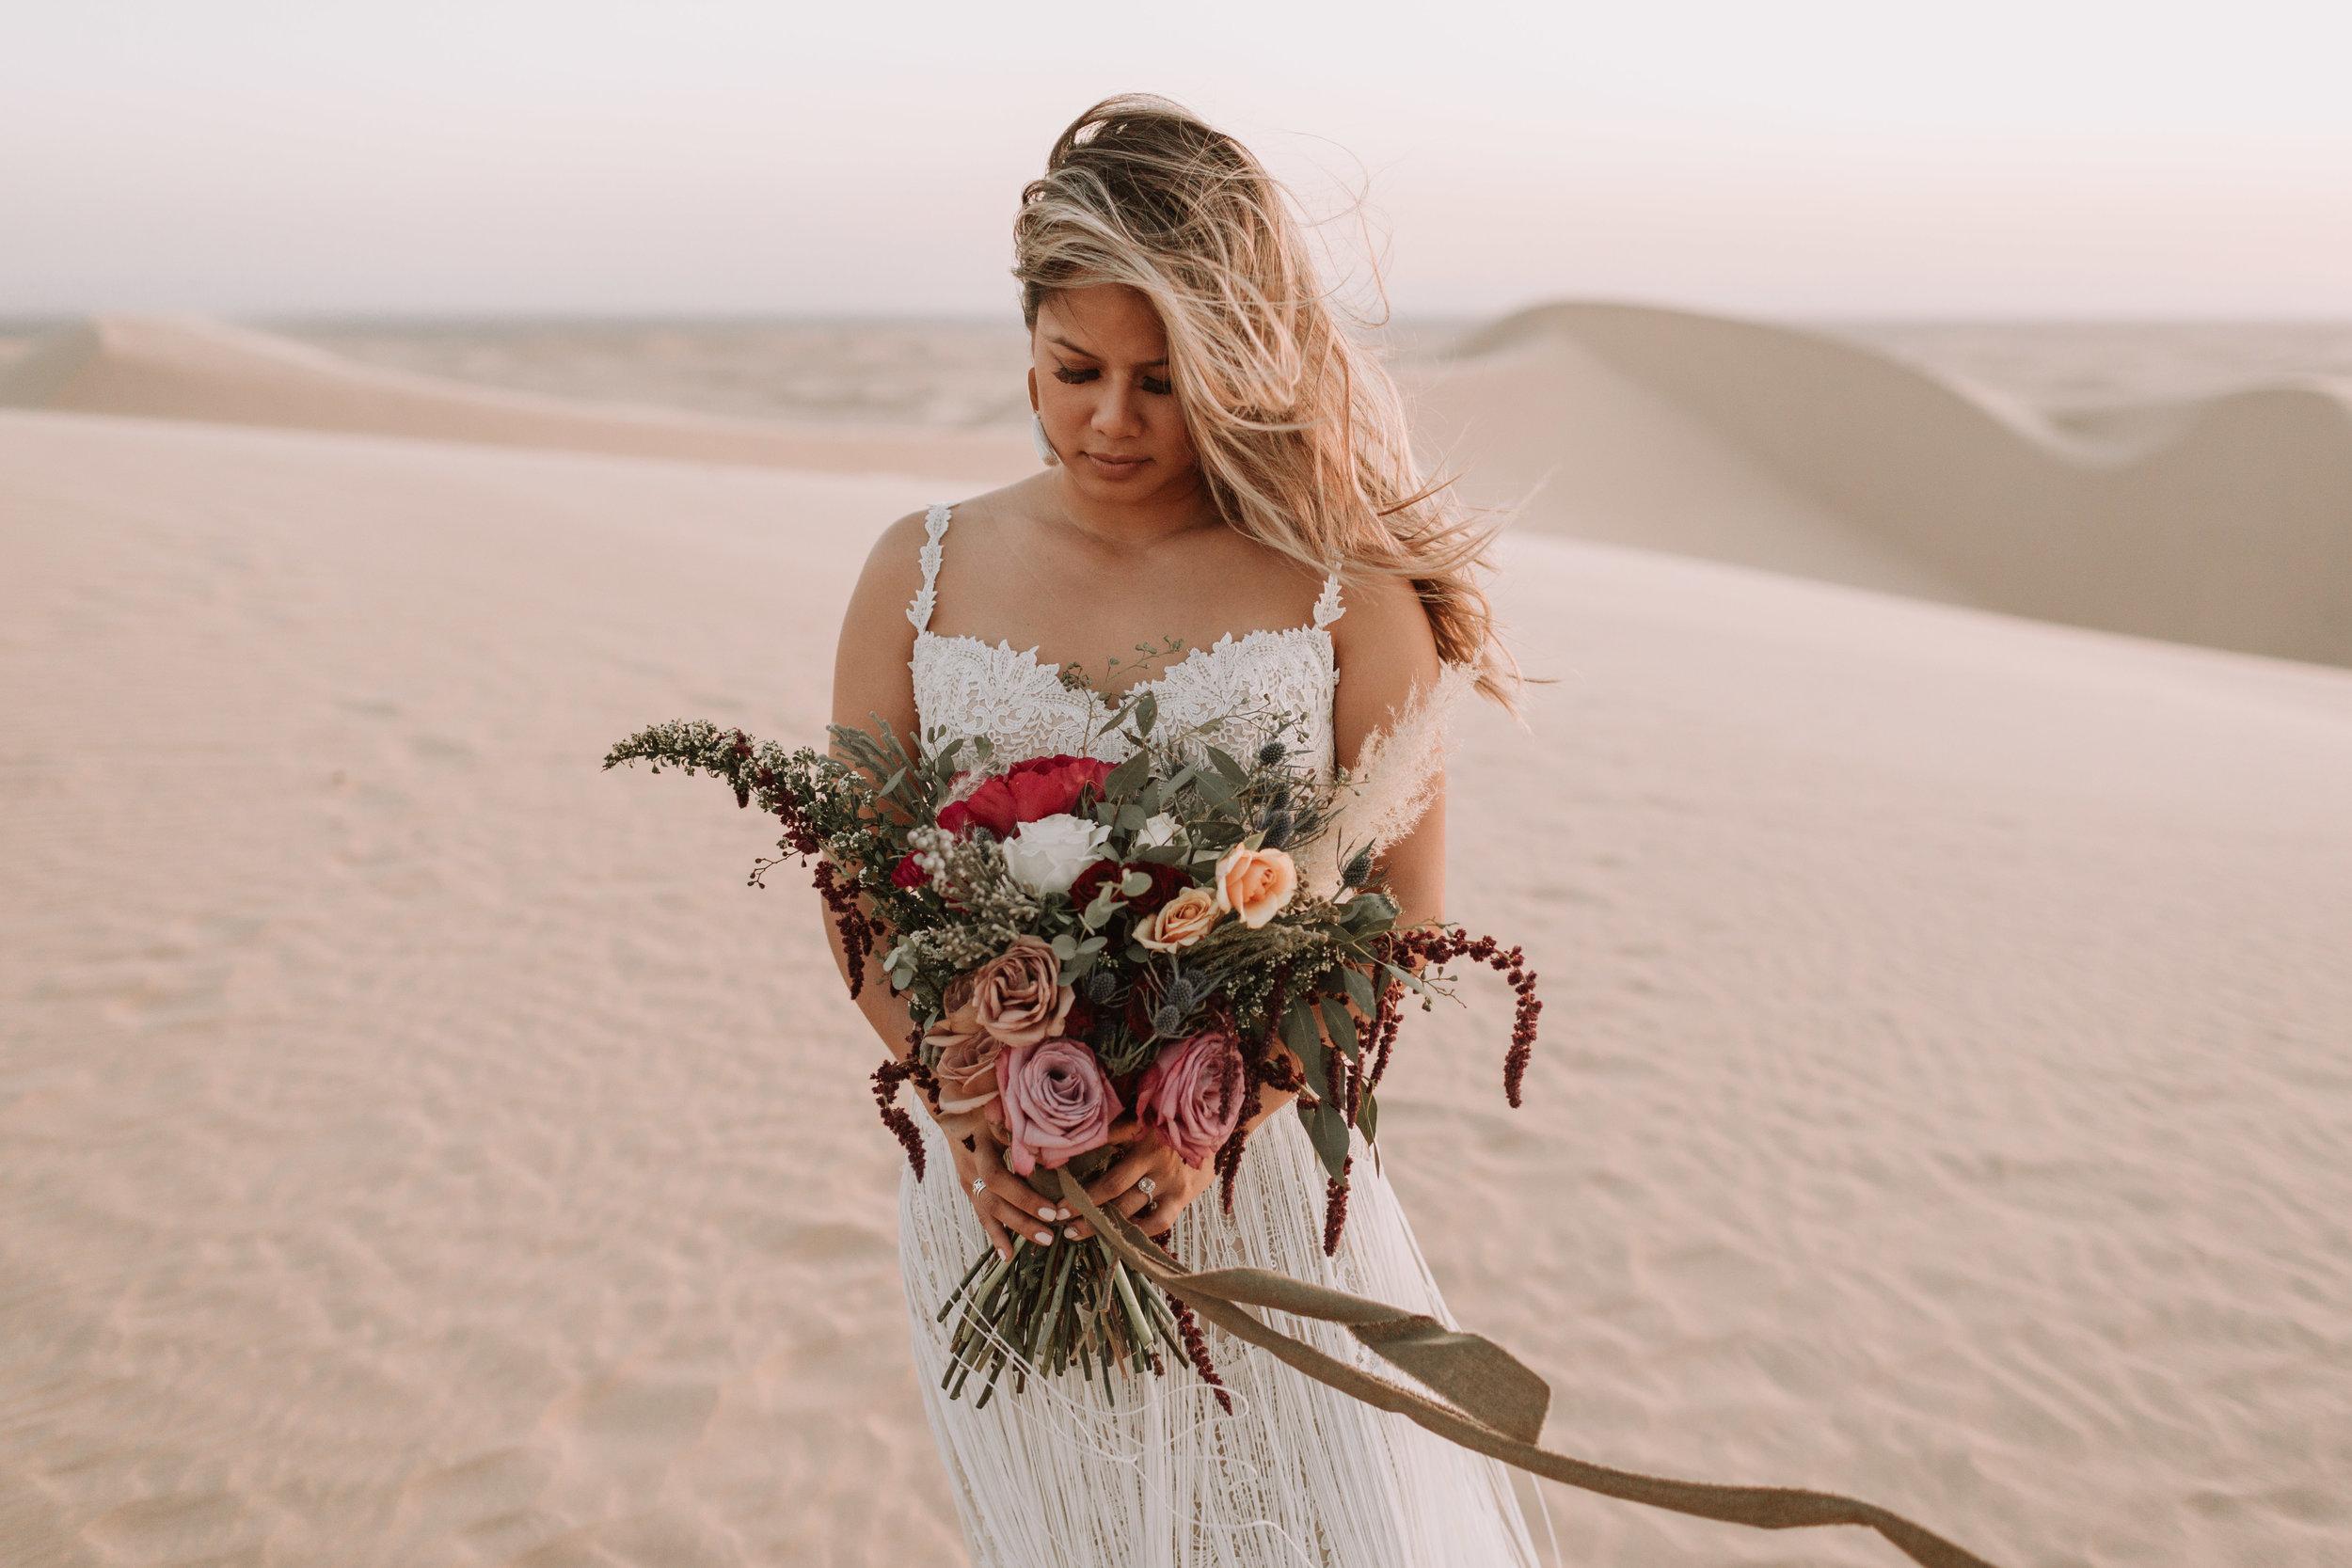 imperial sand dunes destination styled elopement wedding golden hour bridal with foraged fete floral bouquet collaboration